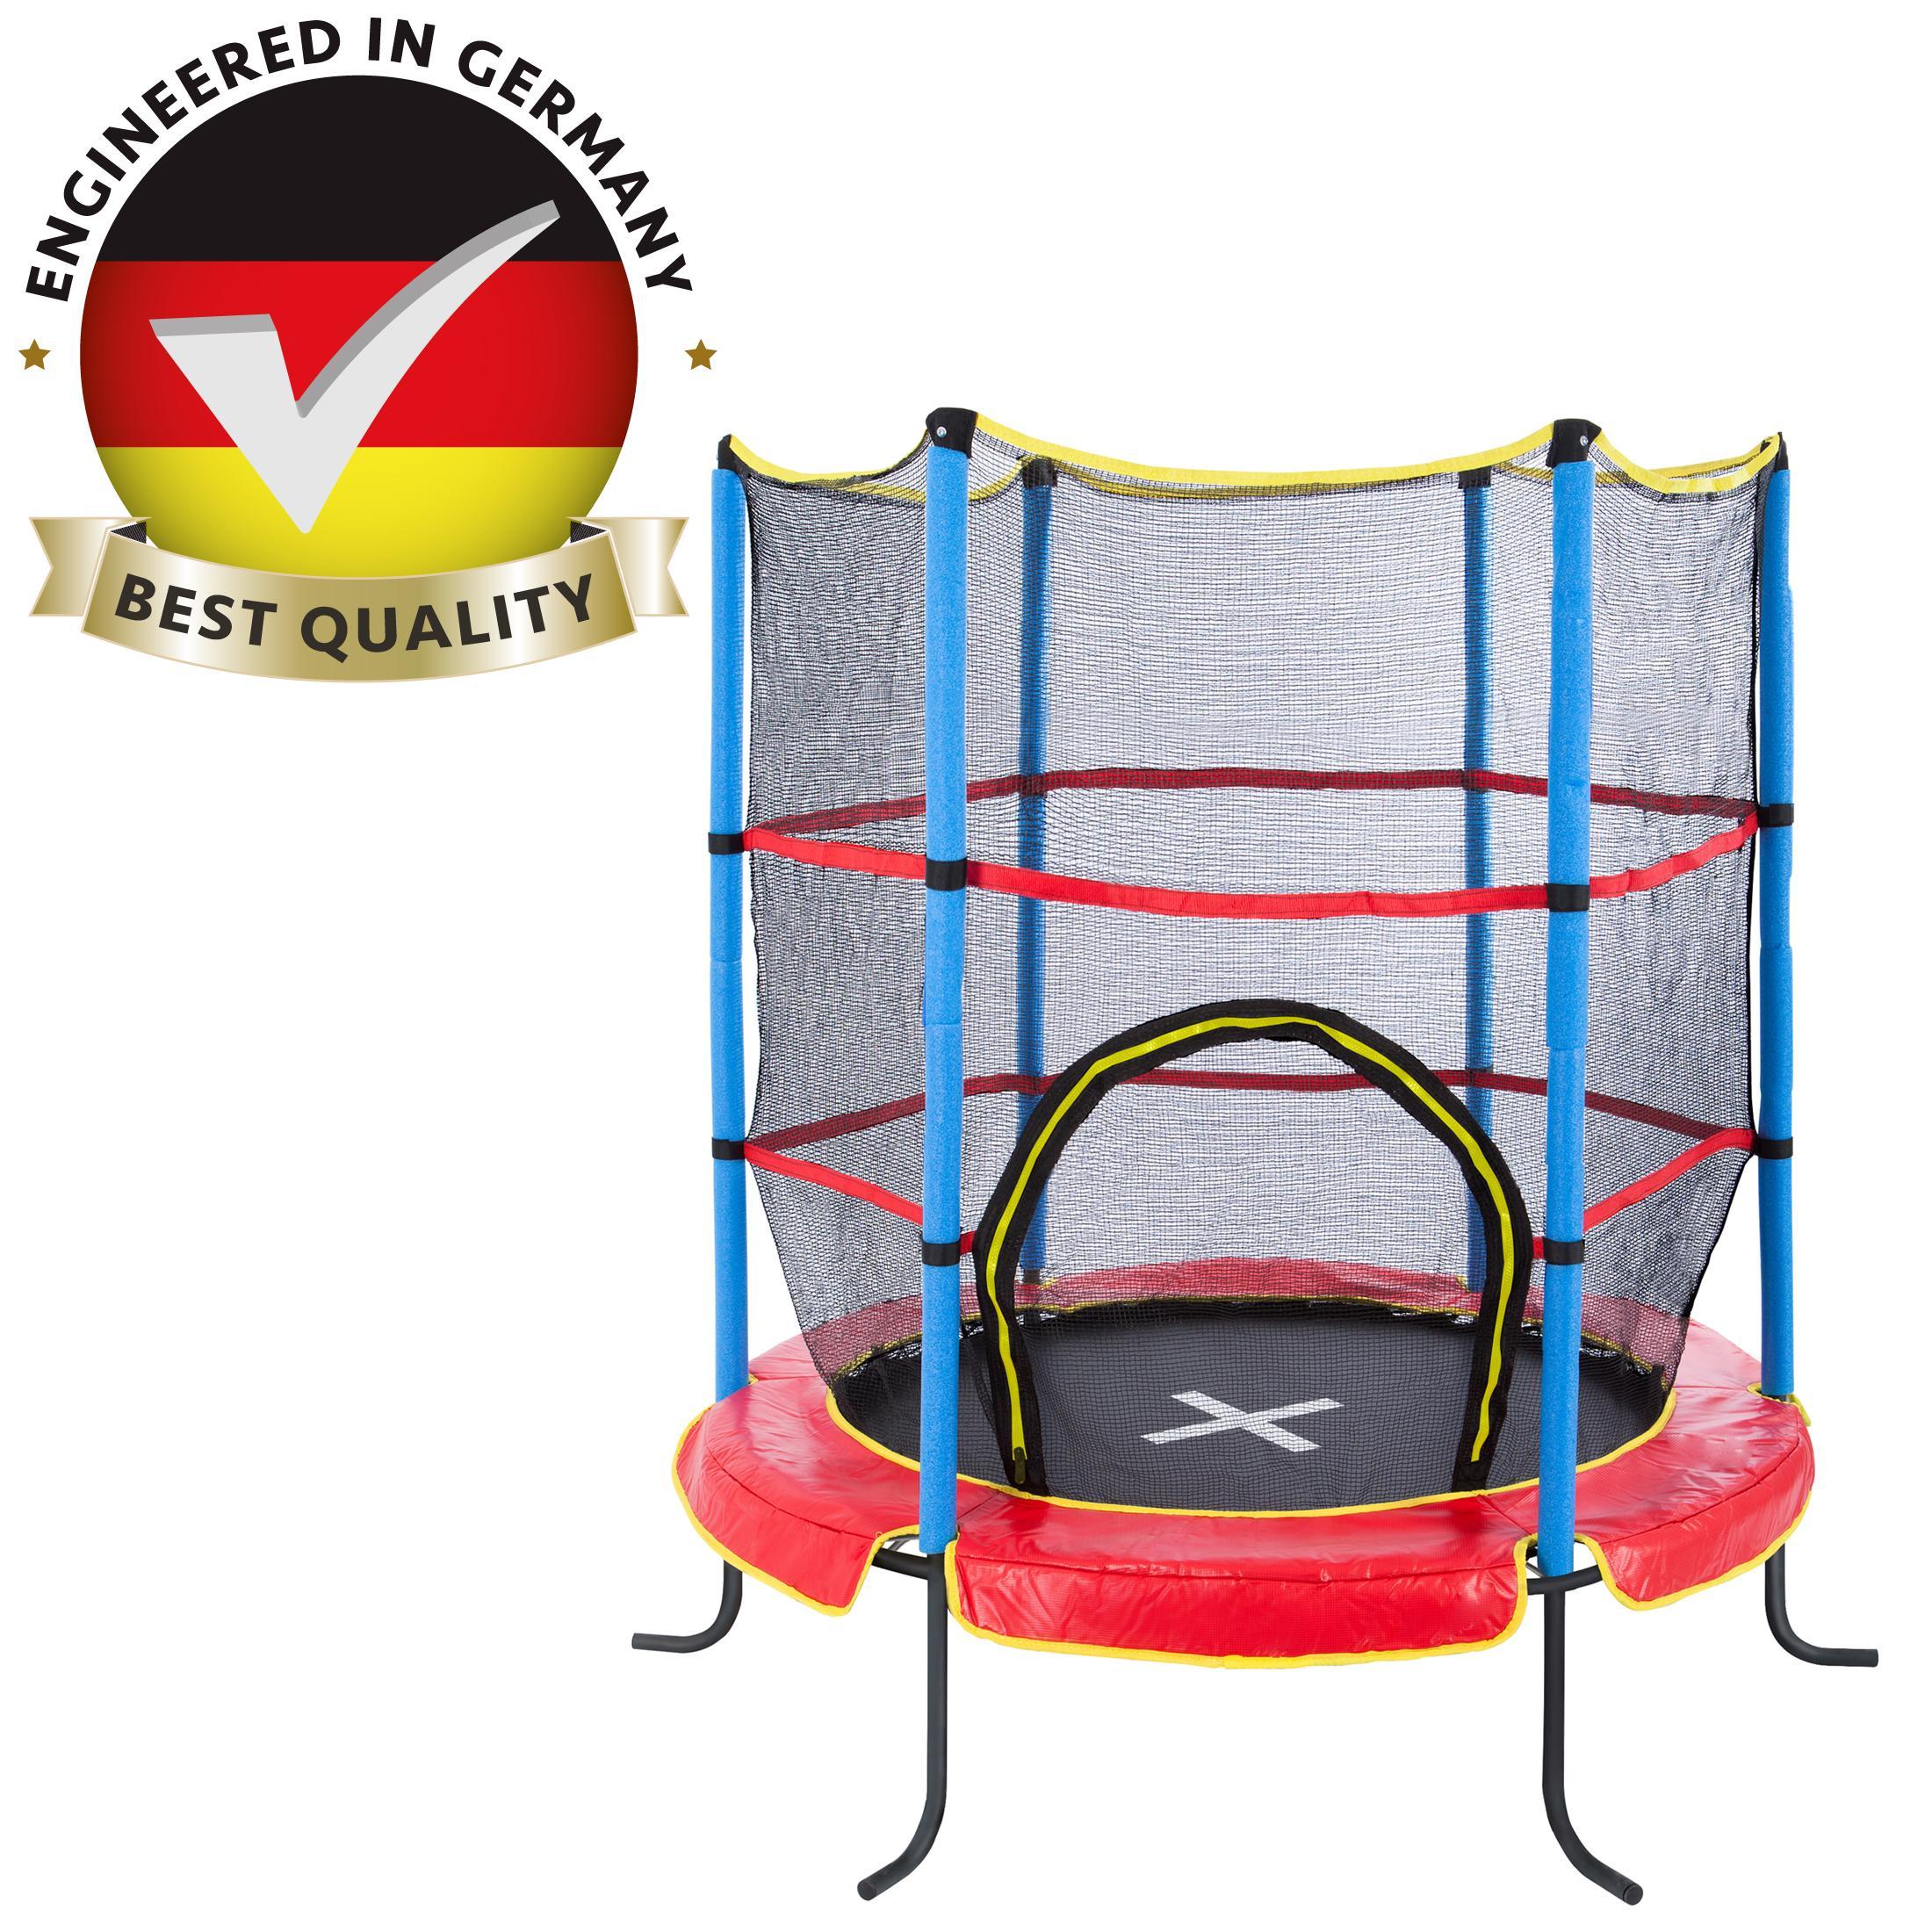 Amazon.com : Ultega Indoor Trampoline Jumper 4.6 Ft With